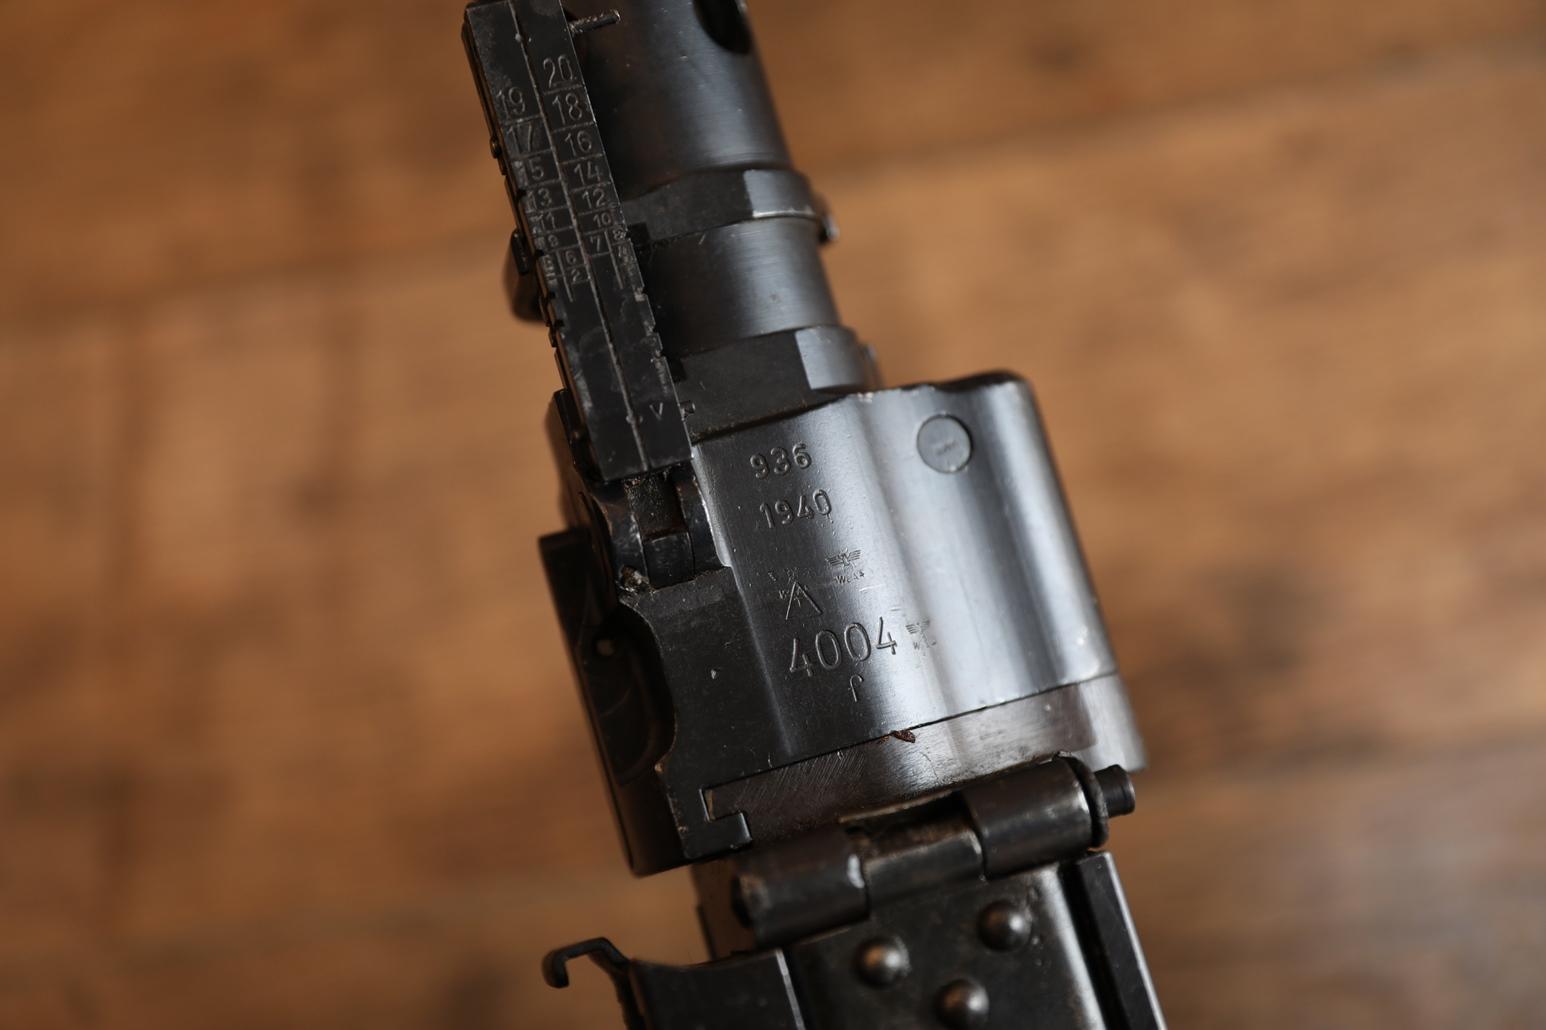 Фото Немецкий пулемет MG-34, #4004f, 1940 год, завод 936 Berlin Suhler Waffenfabrik